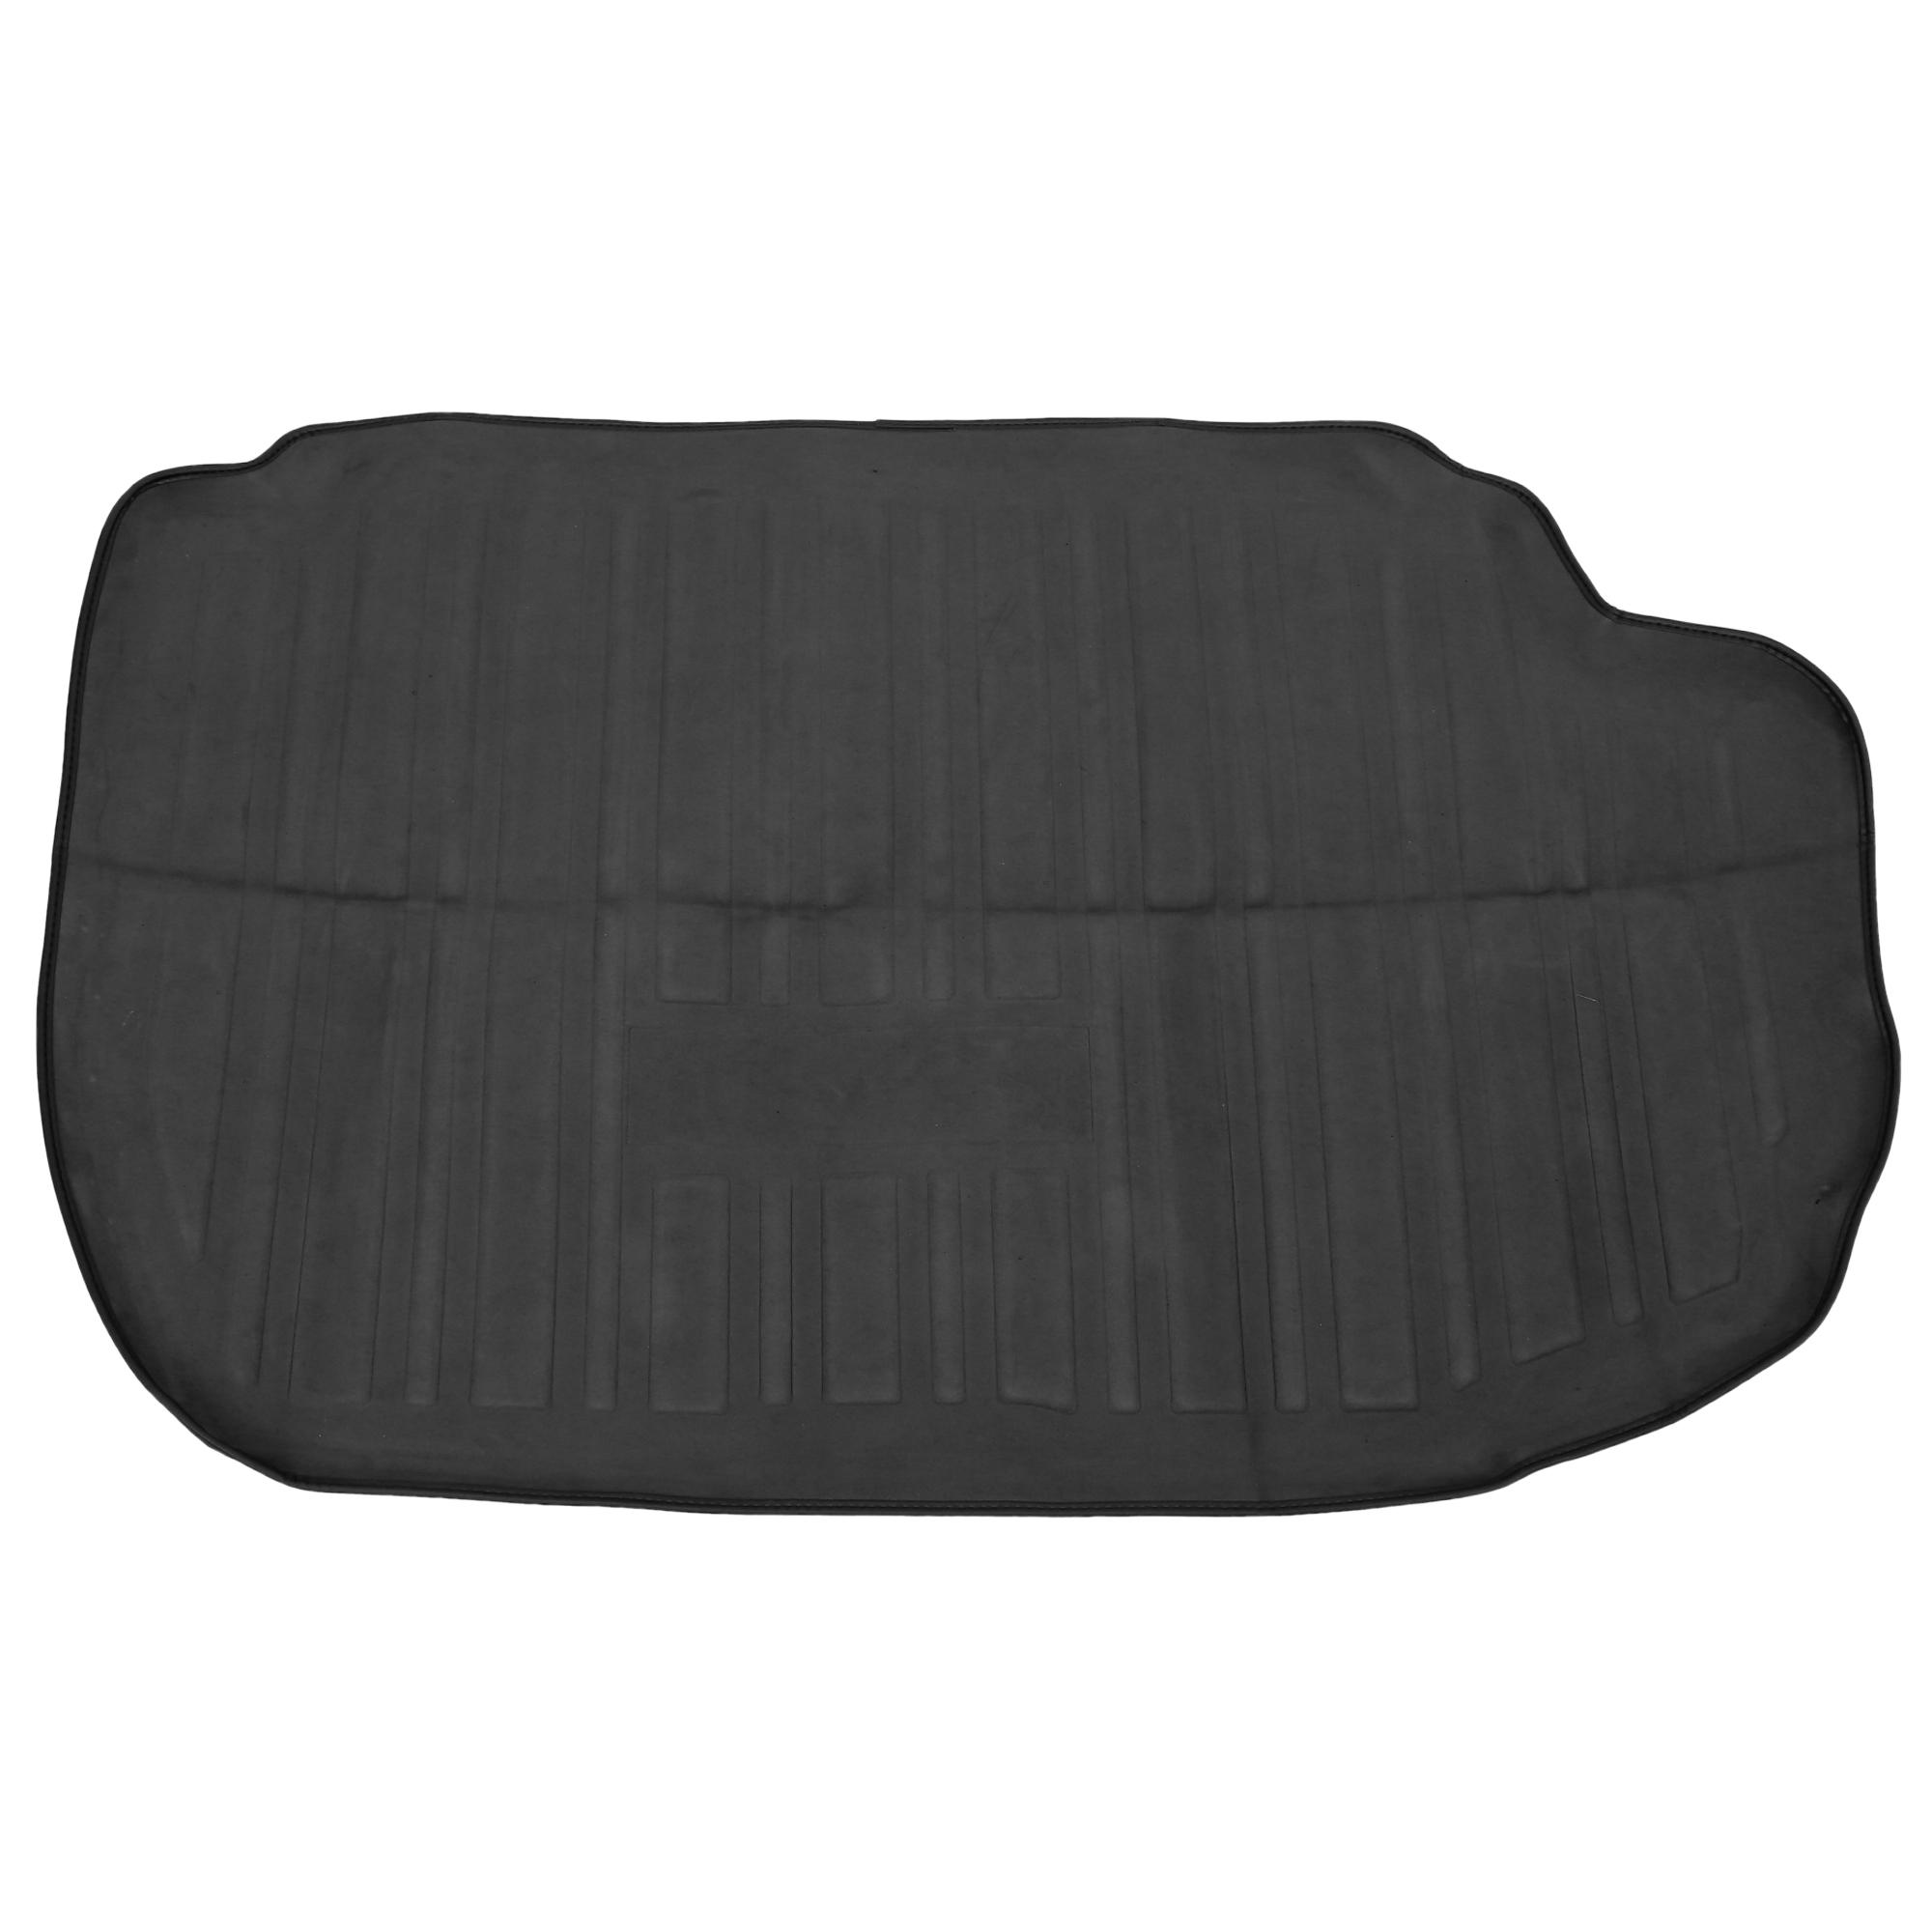 Car EVA Trunk Cargo Mat Rear Trunk Liner Tray Pad for Mercedes Benz S Class